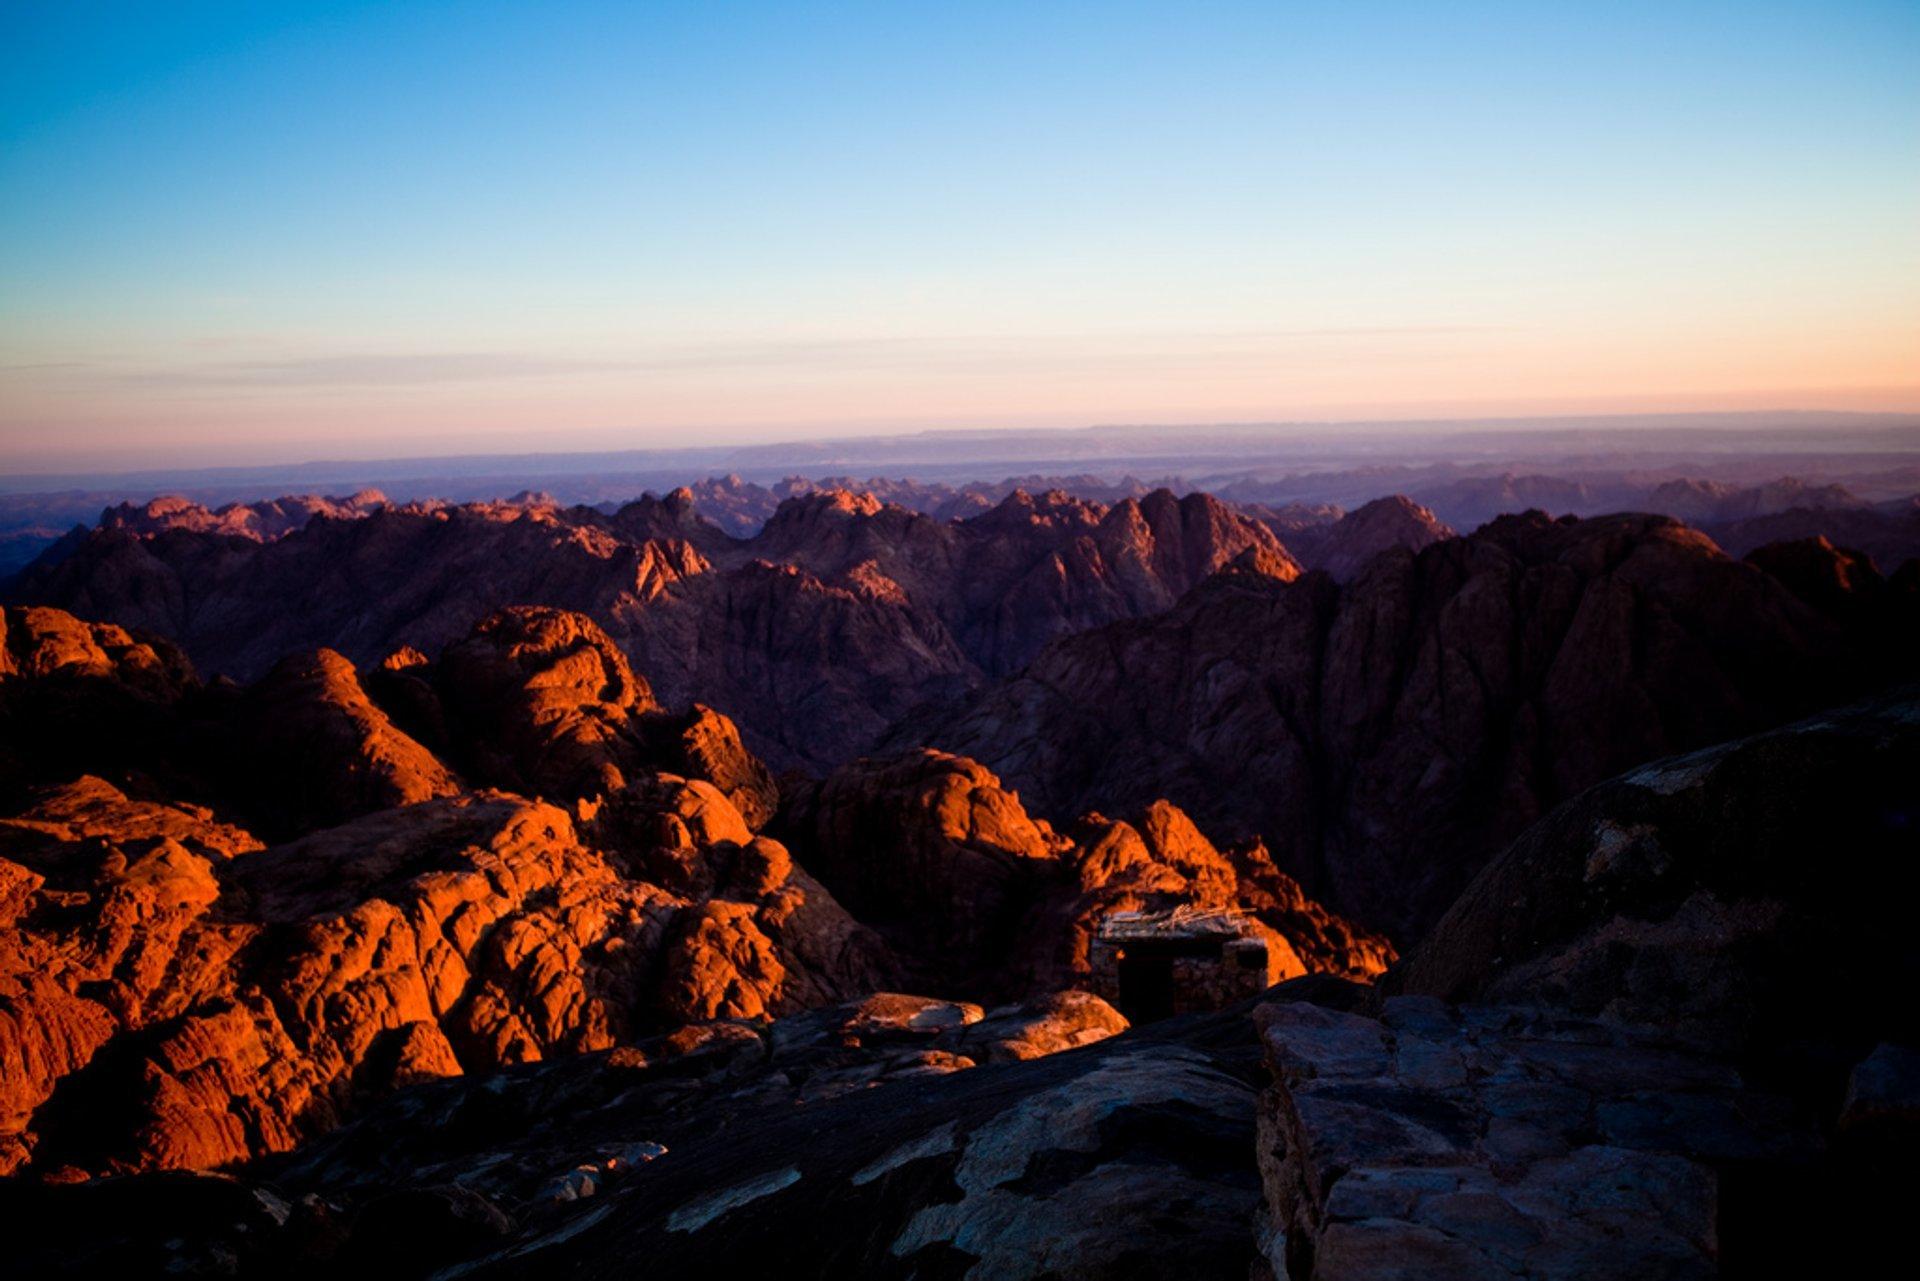 Sunrise over Mount Sinai